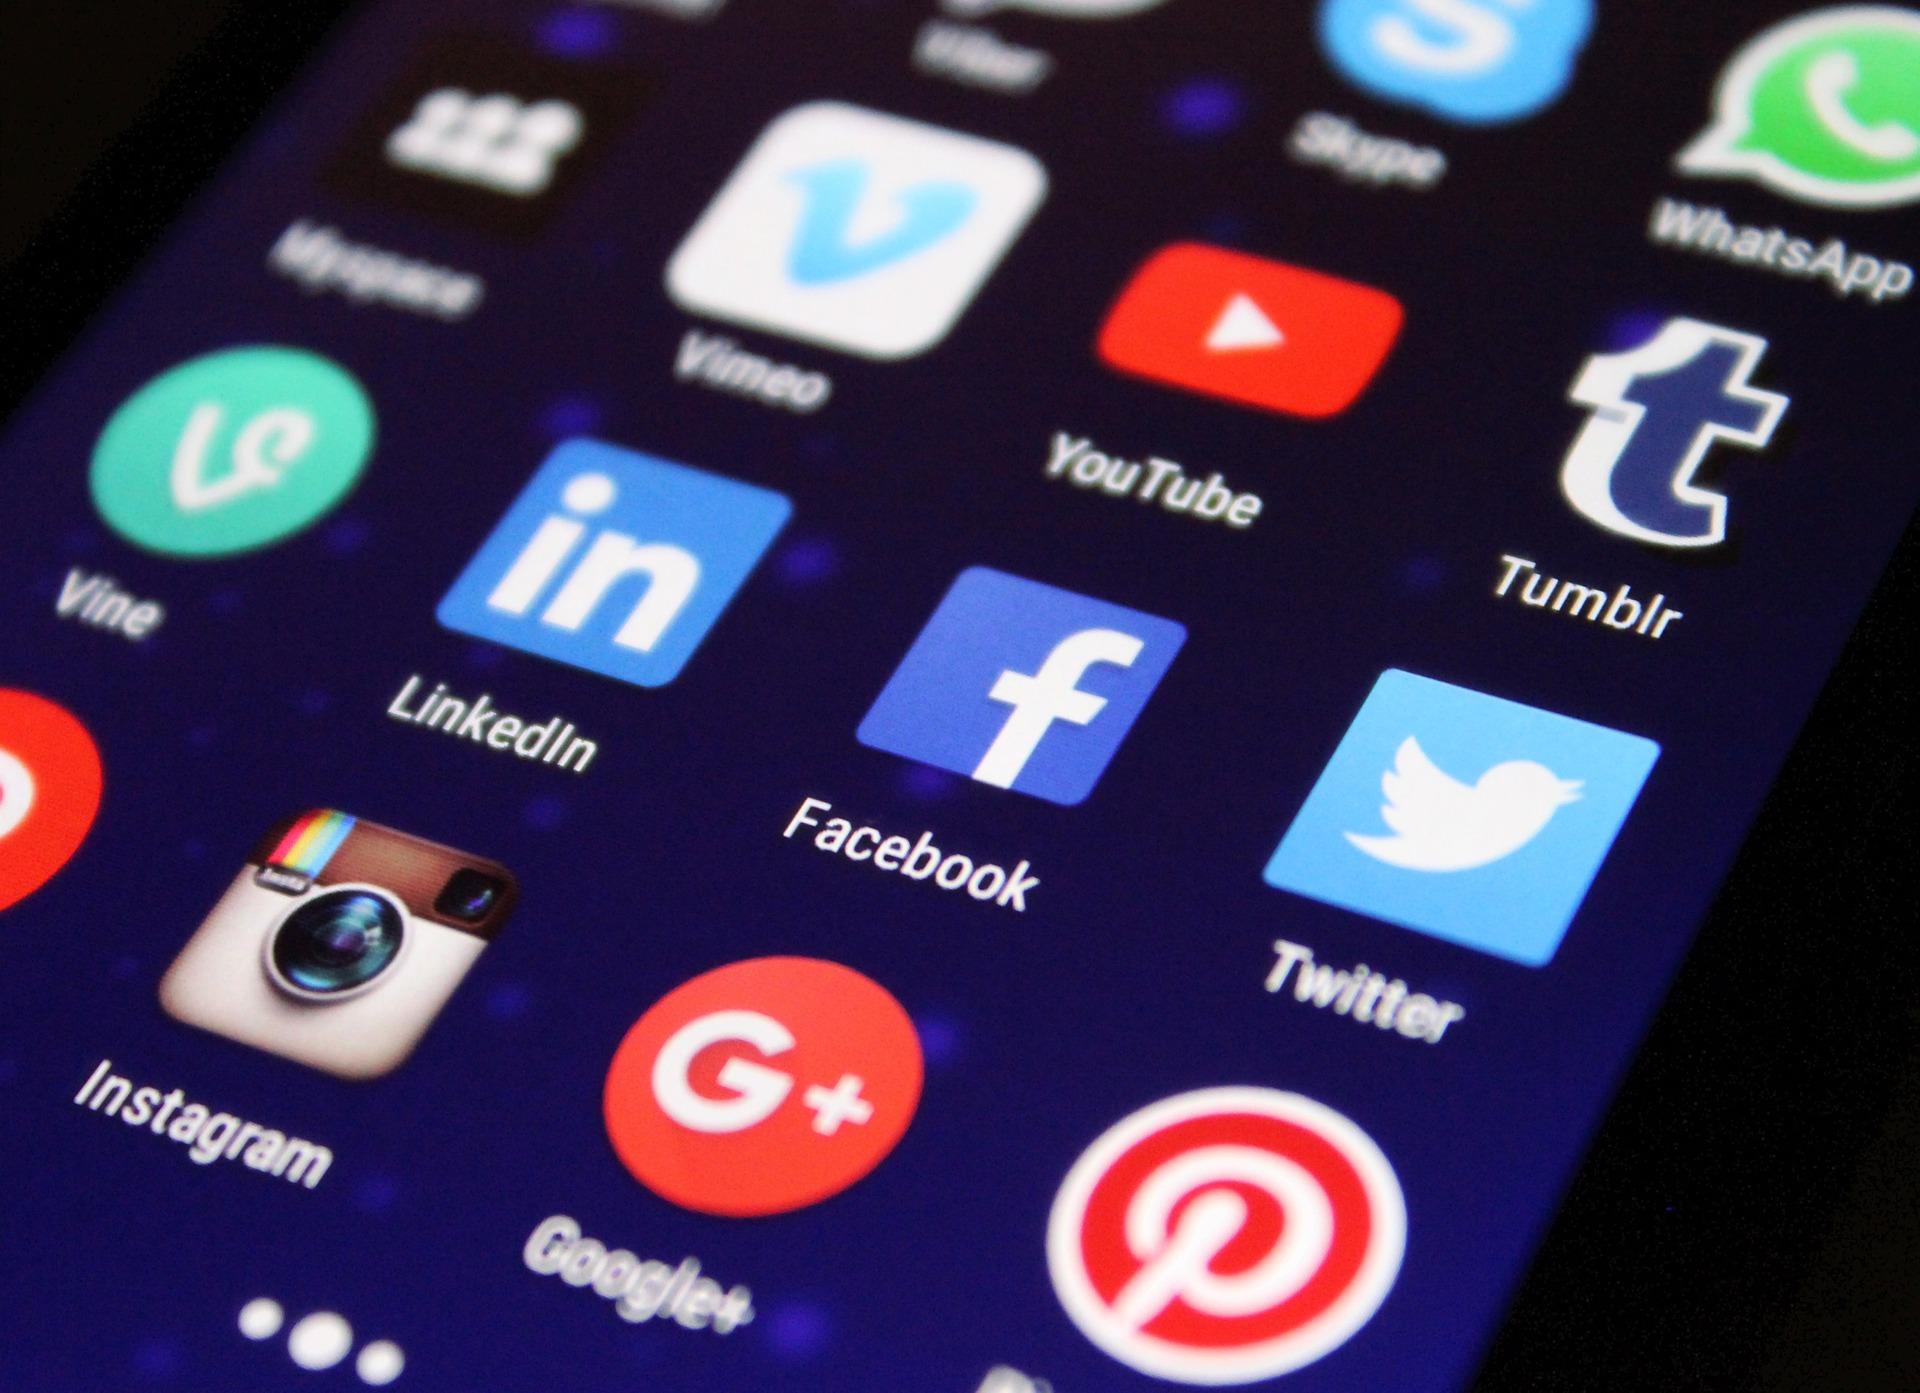 Top social media stories